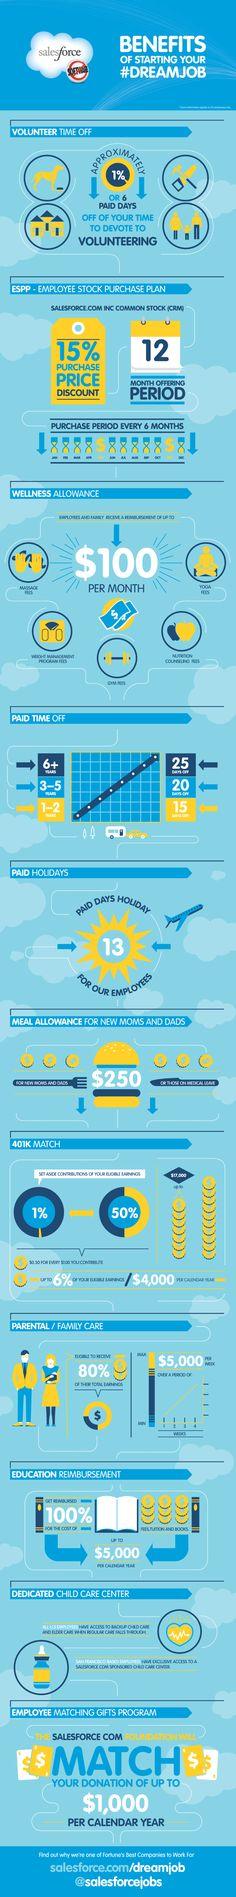 Salesforce.com employer branding #infographic